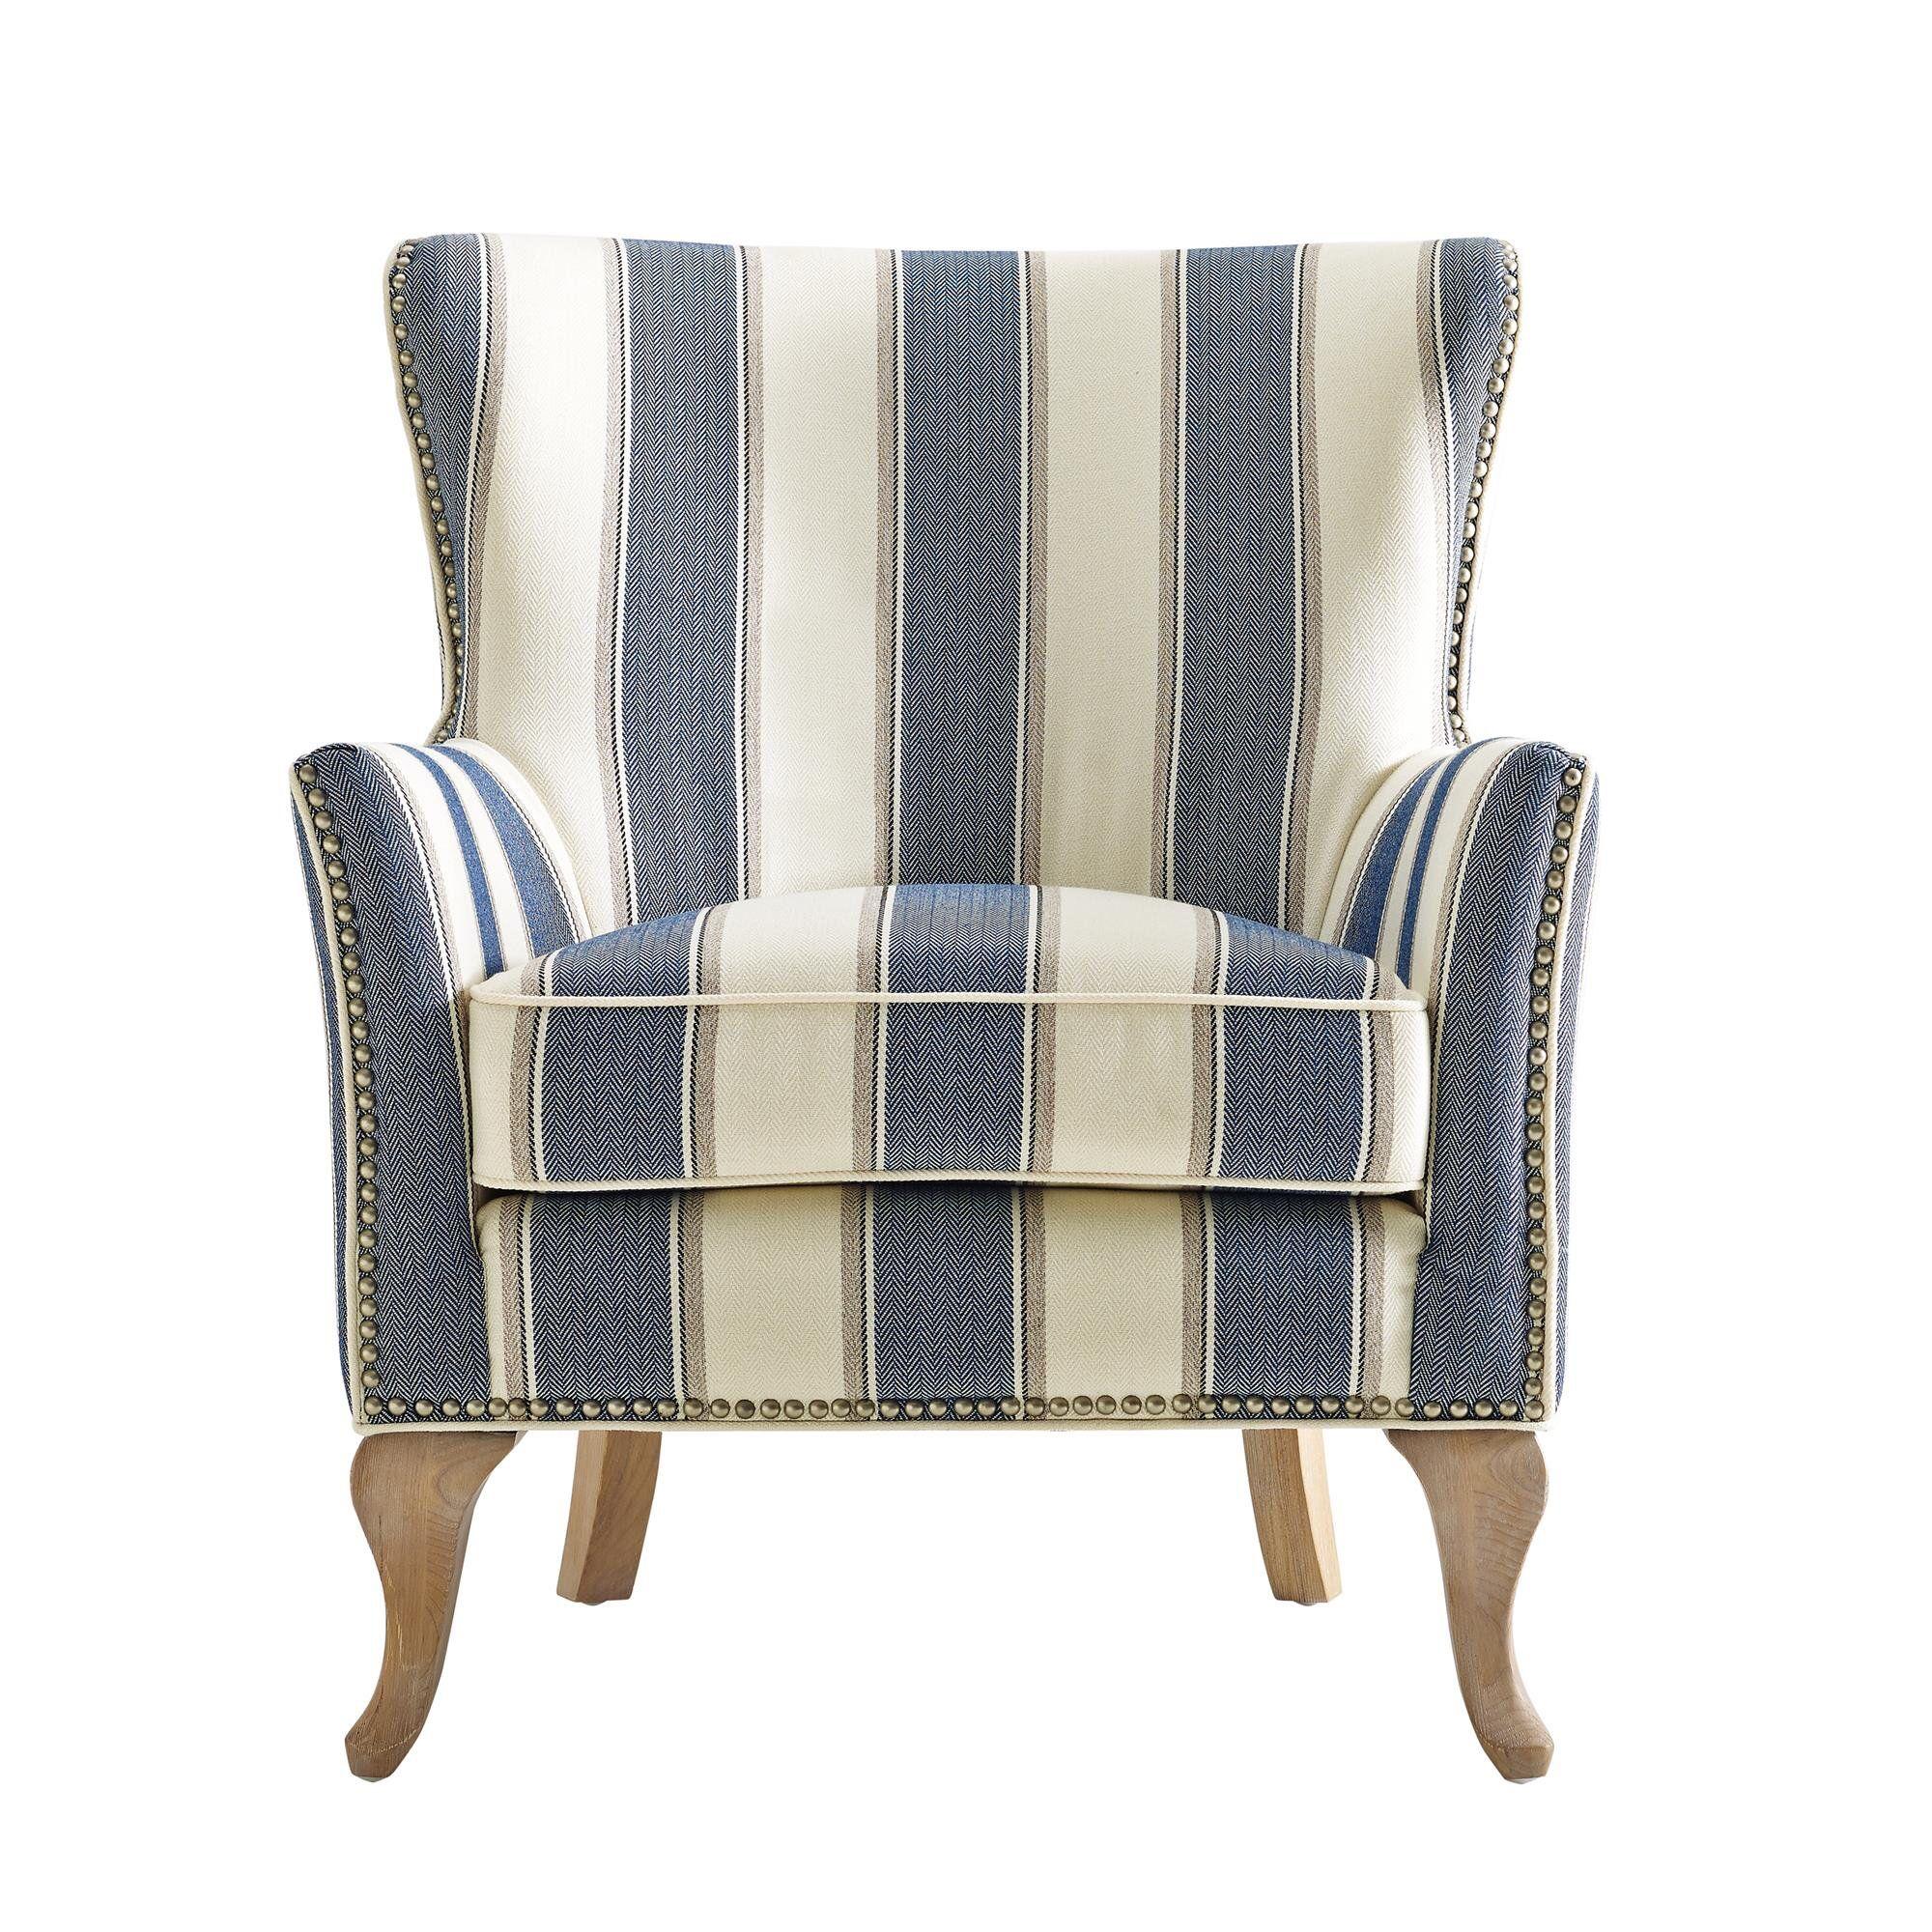 Charles Wingback Chair Navy Deco Stripe: Zubair Wingback Armchair